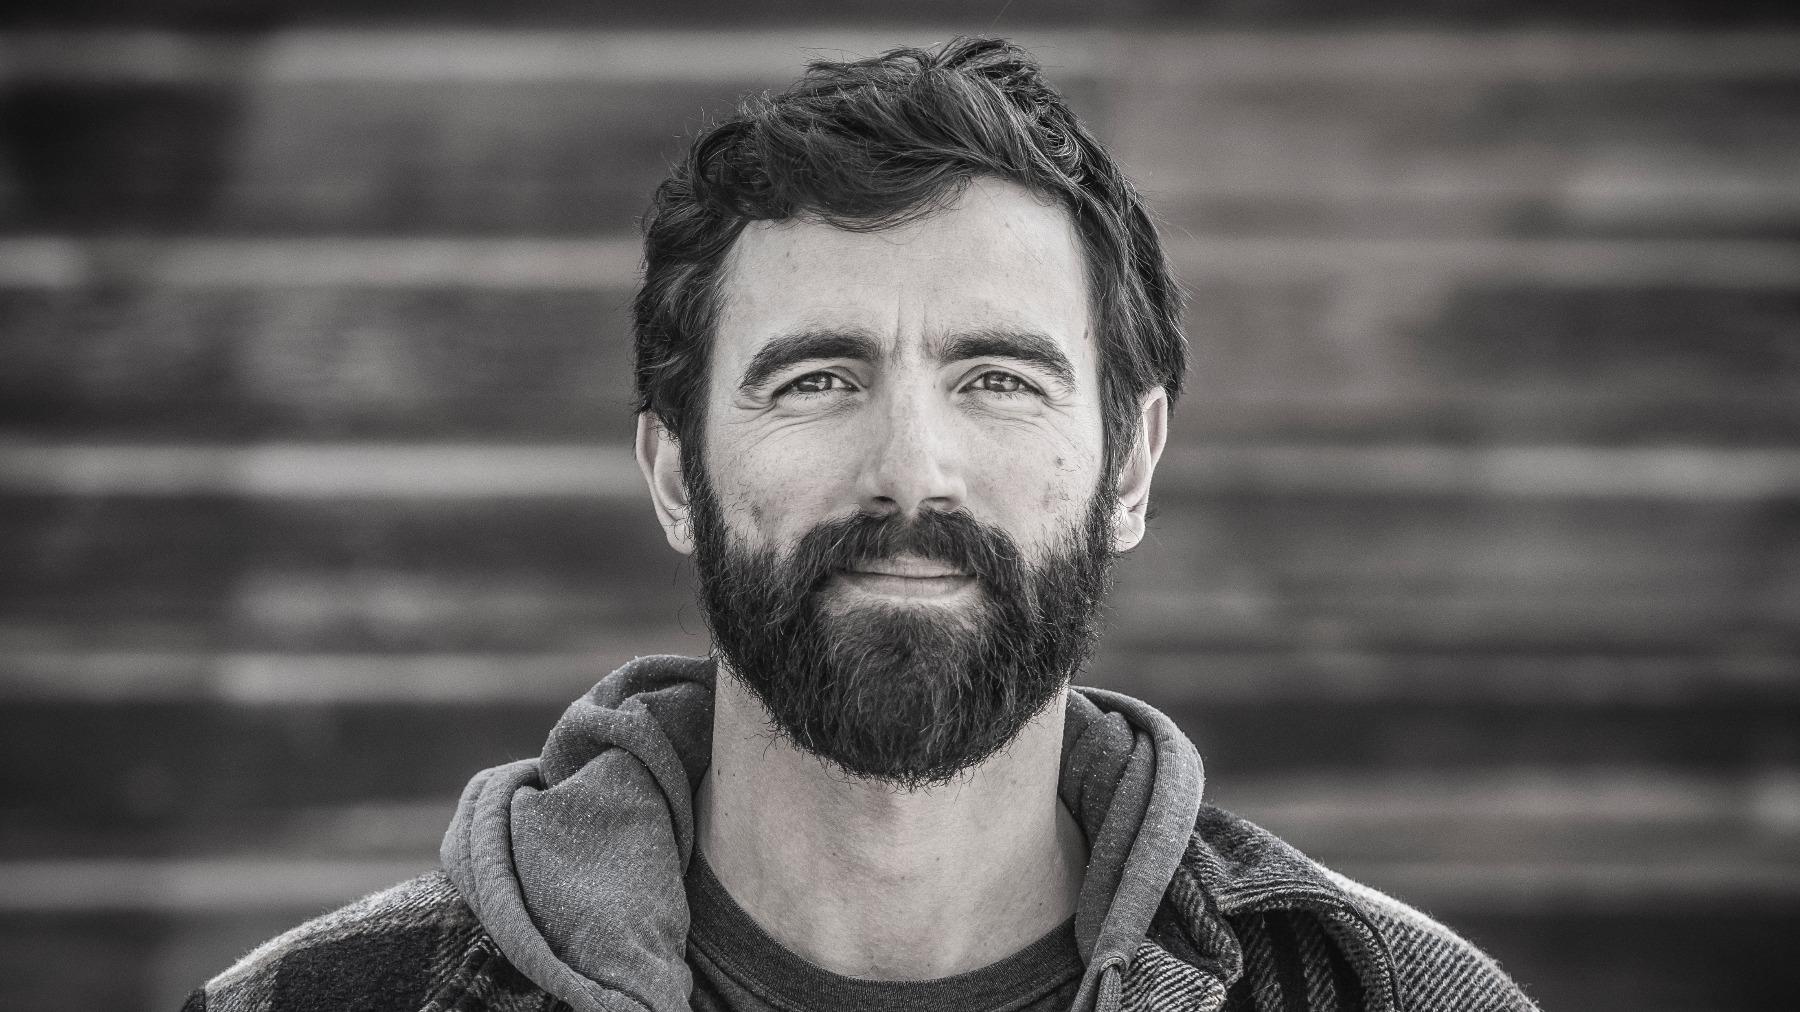 Ryan Acker Album Release